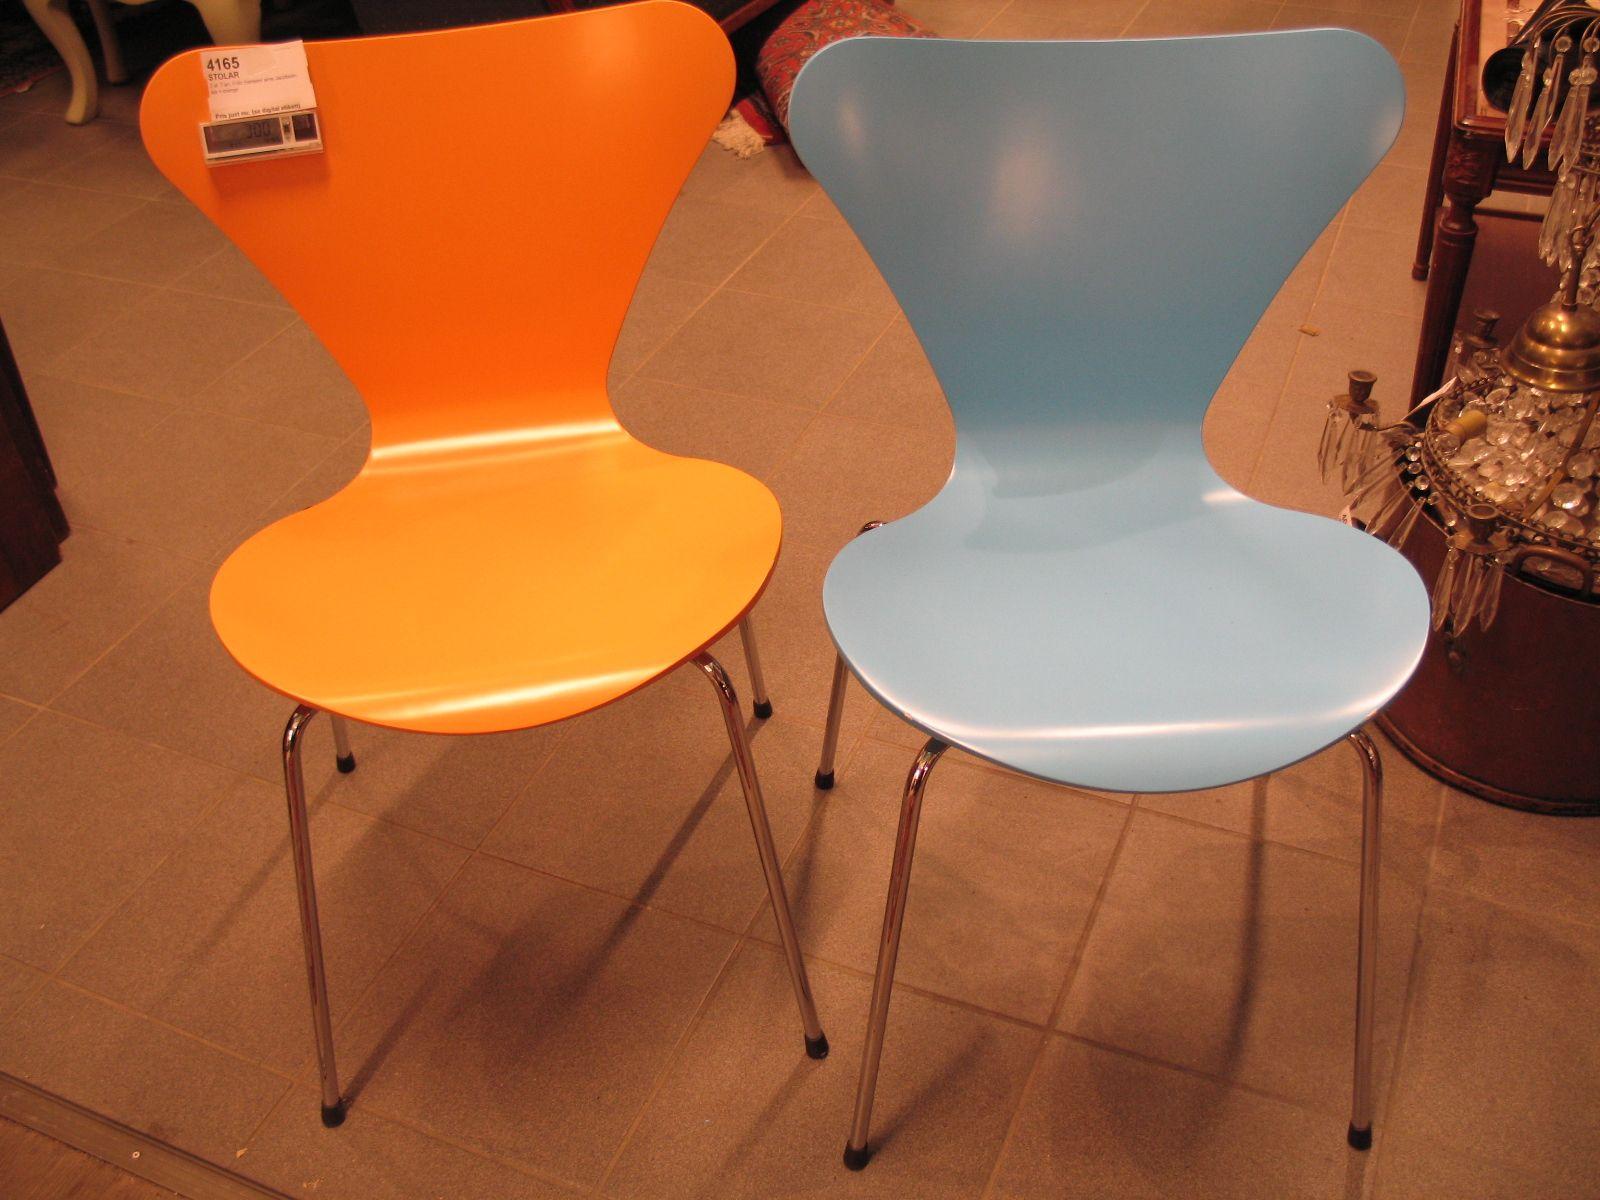 Myran Stol Kopia Free Fiber Chair Tube Muuto With Myran Stol Kopia Masters Stol Miljgrdens